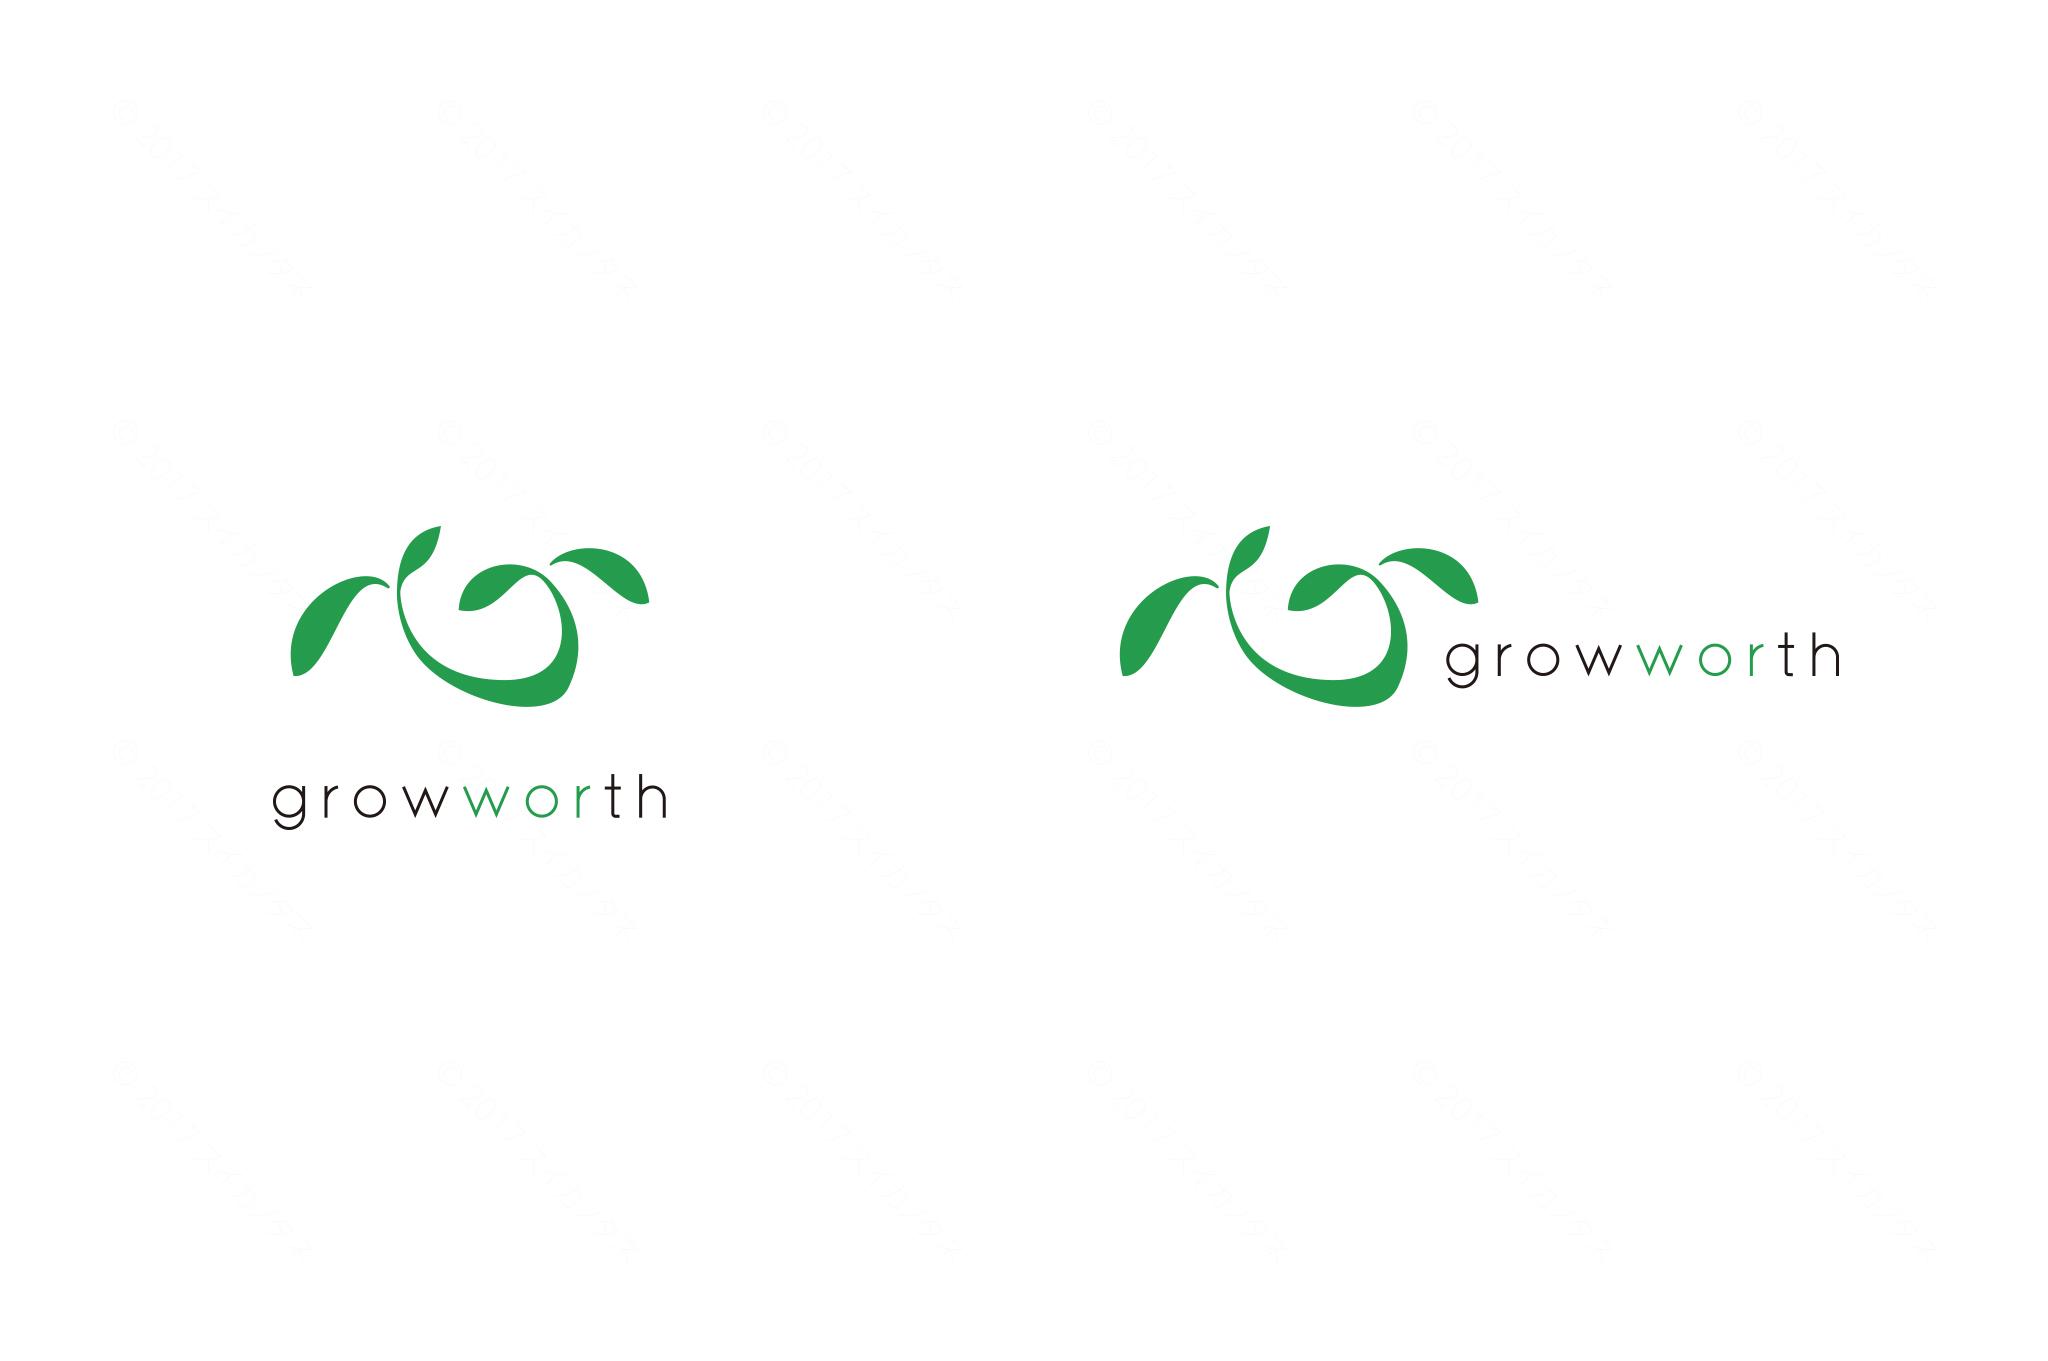 CIロゴ、名刺の企業ブランディングデザイン, CI Logo, Business Card